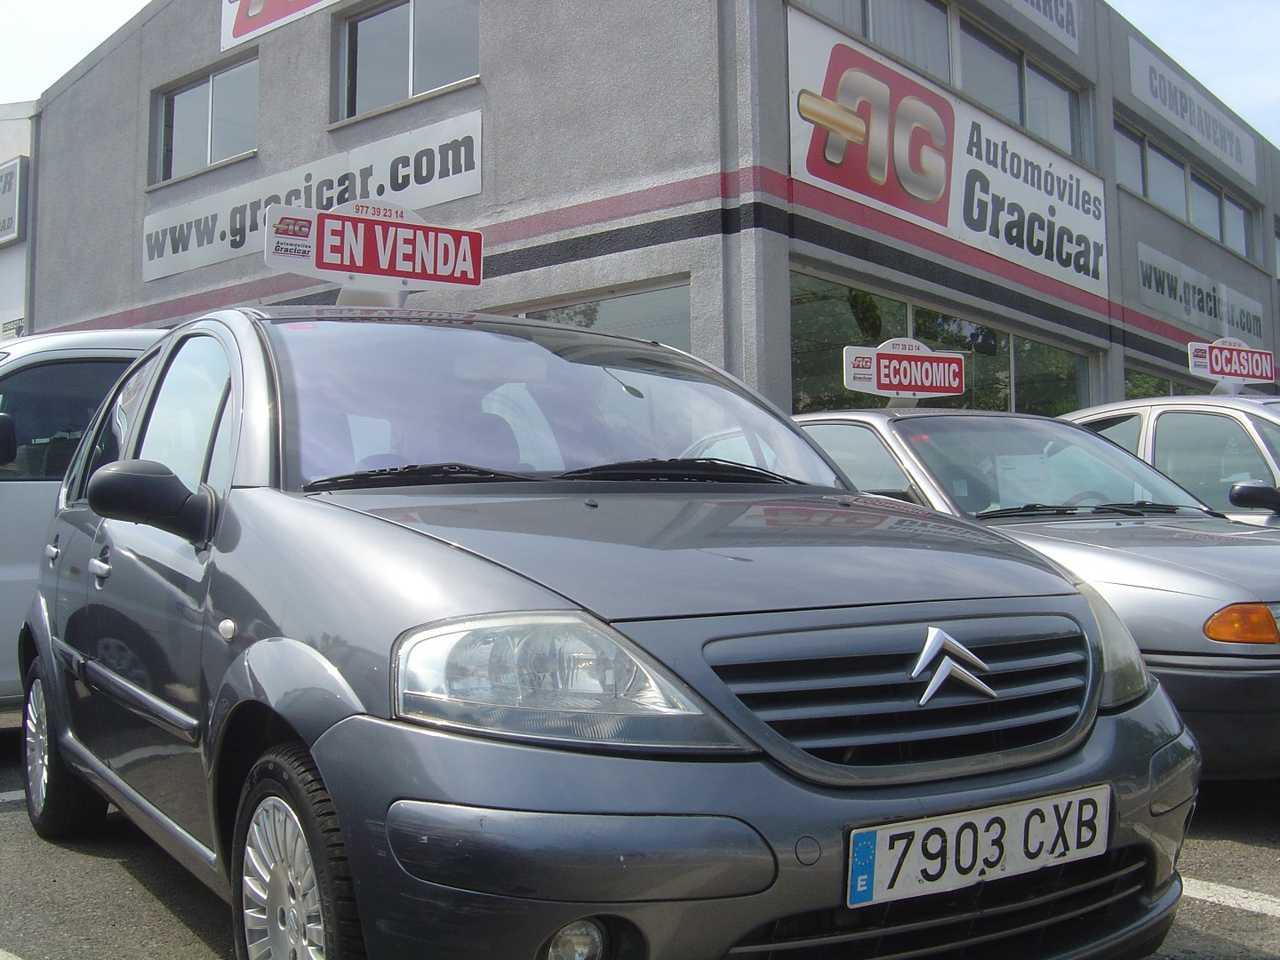 Citroën C3 1.4 HDI  68 CV   - Foto 1